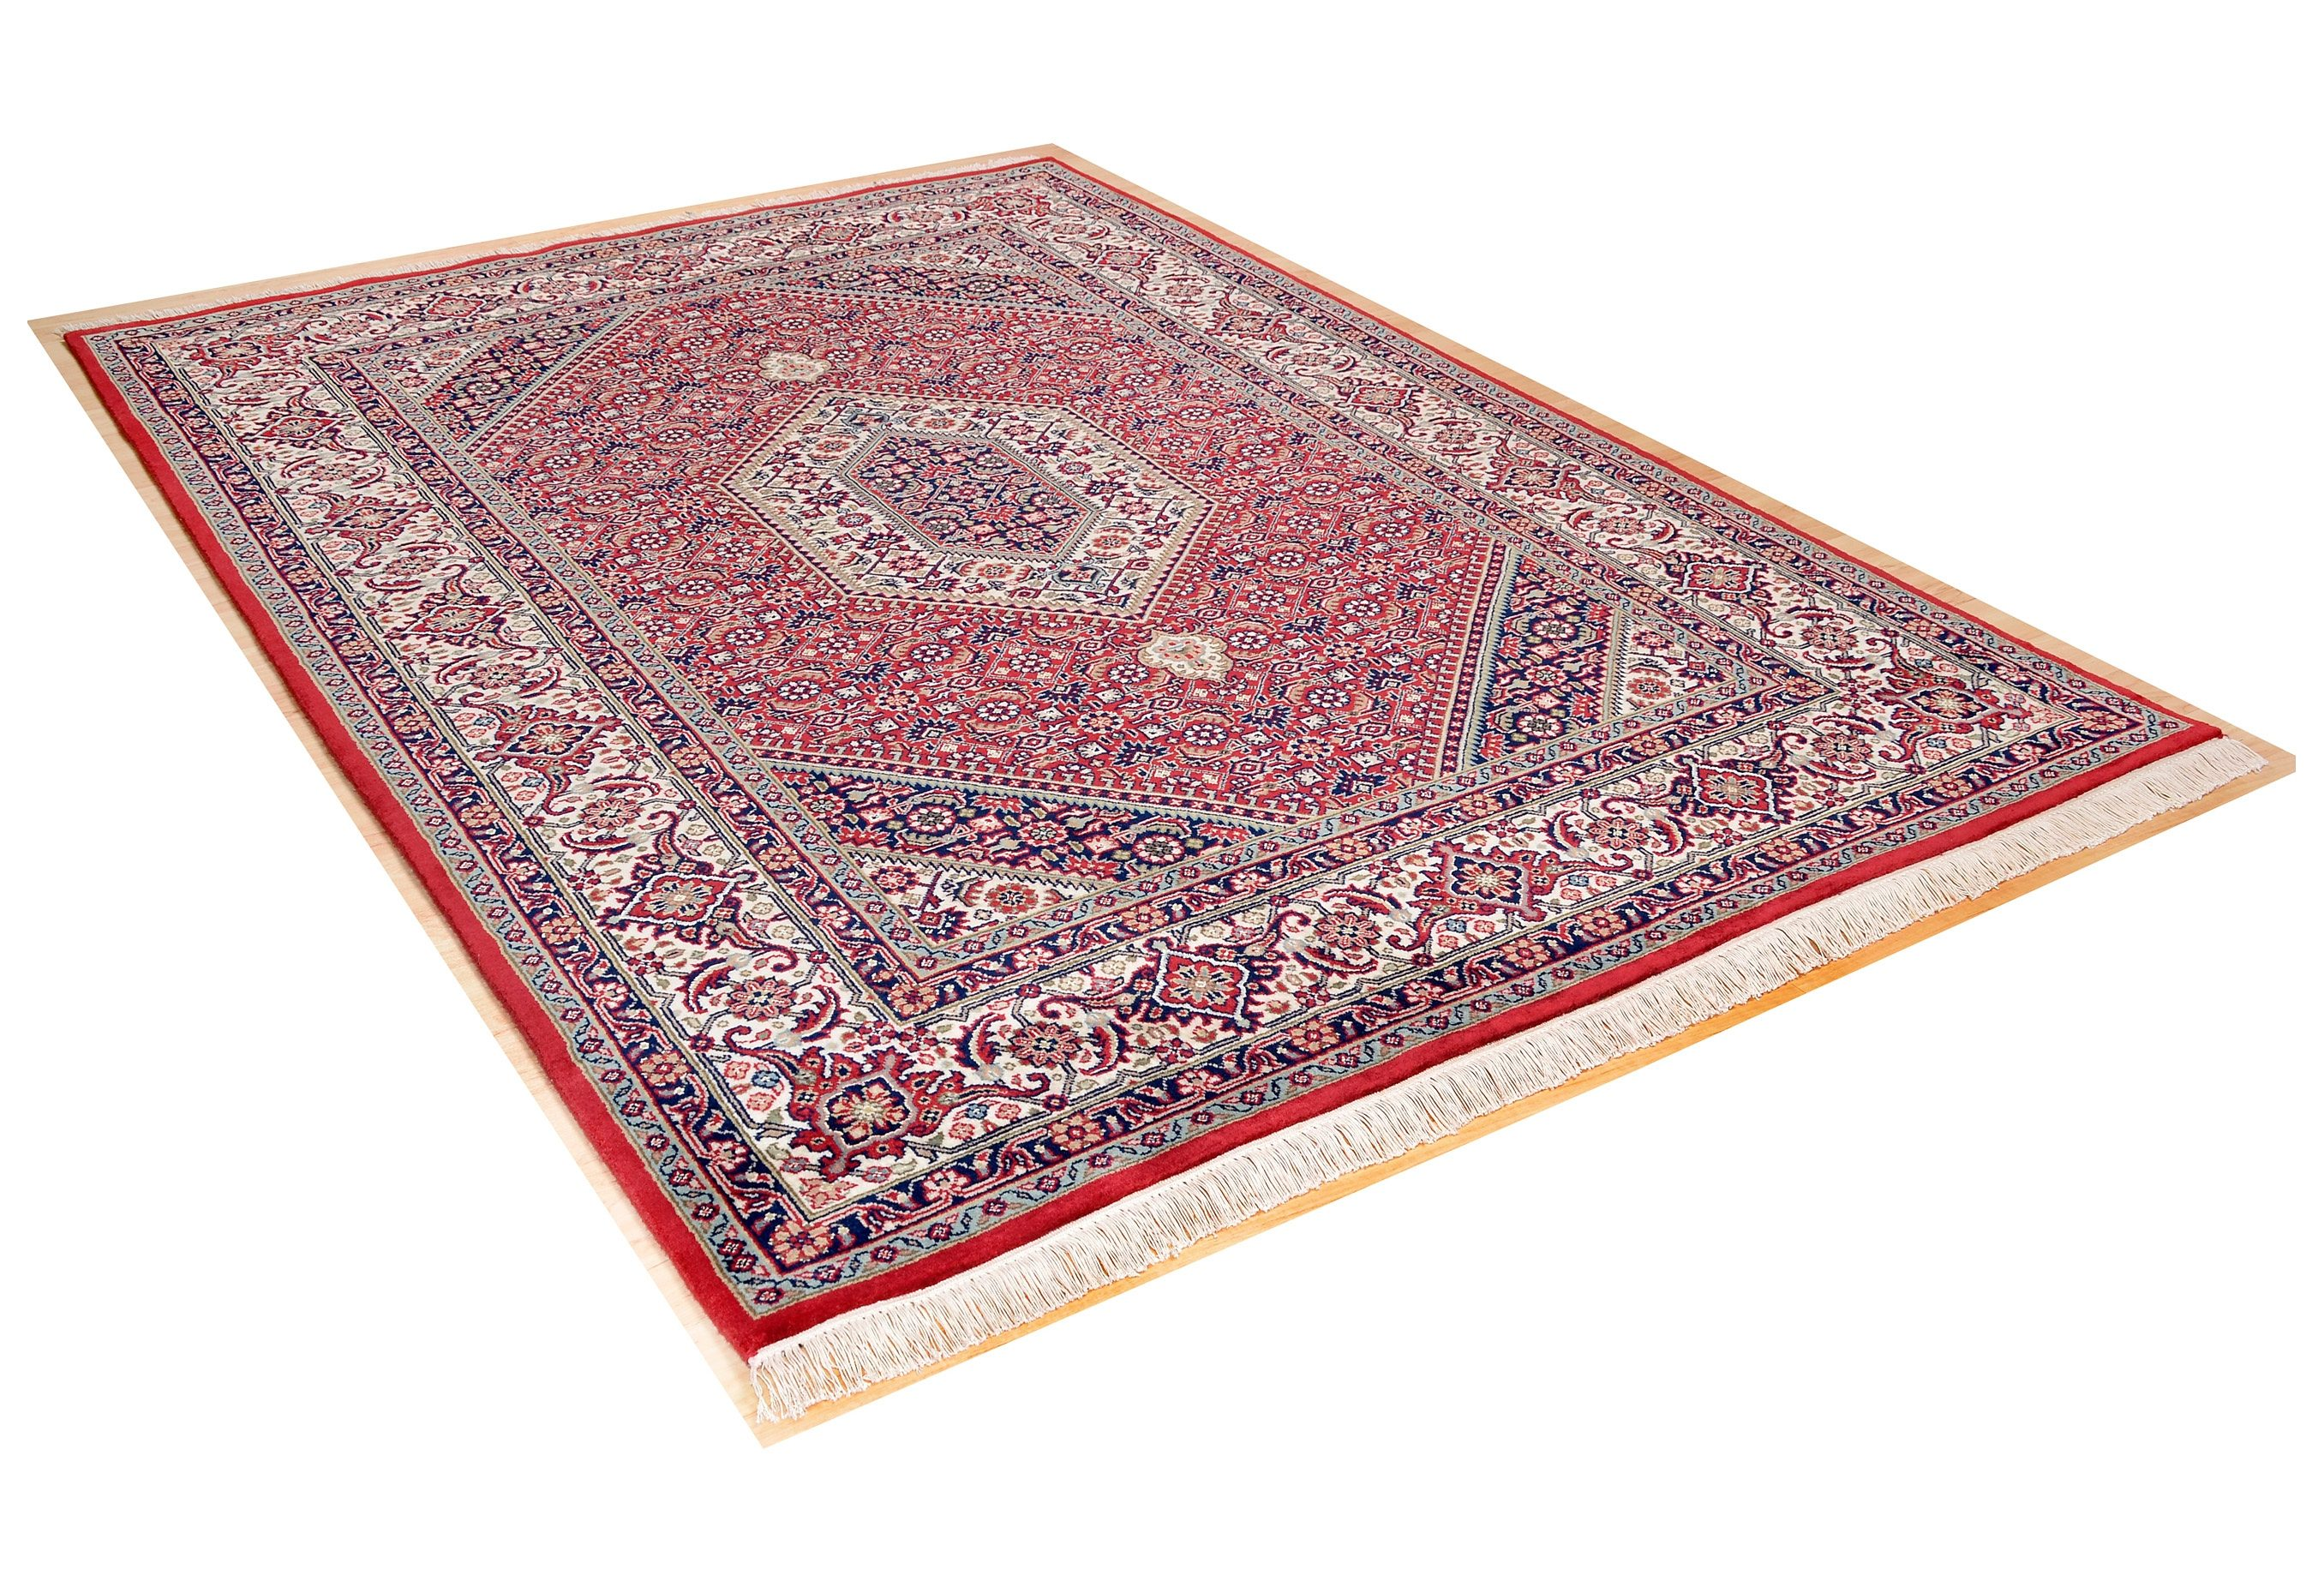 Orientteppich Meraj Silk Touch Bidjar THEKO rechteckig Höhe 12 mm manuell geknüpft